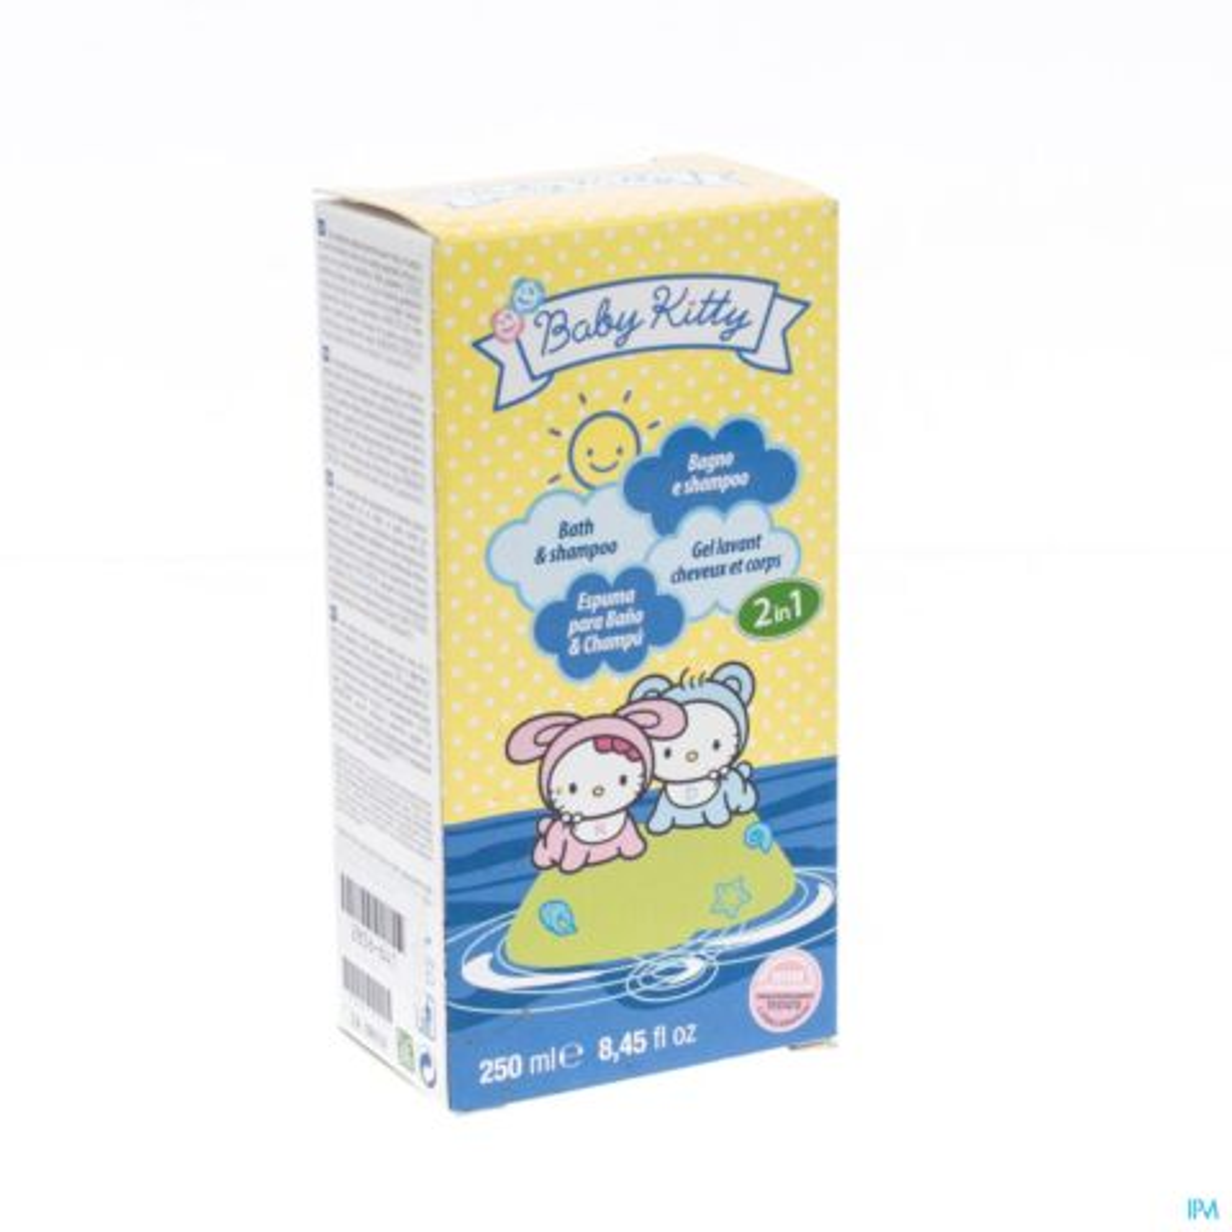 Hello Kitty Baby 2en1 Bain Et Sh 250ml